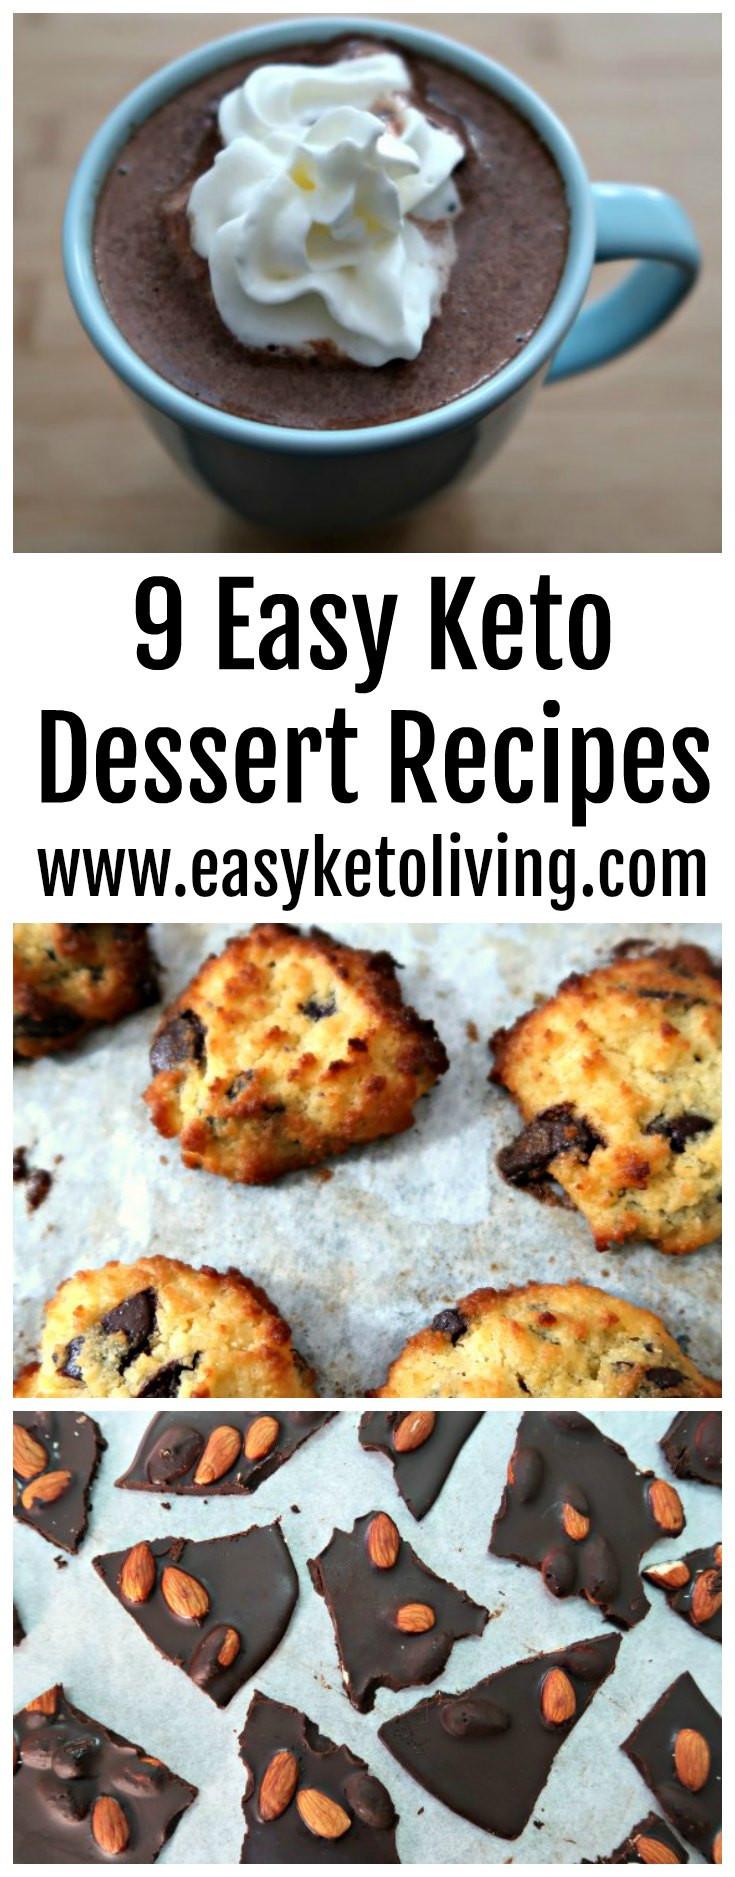 Quick Keto Desserts  9 Easy Keto Dessert Recipes Quick Low Carb Ketogenic